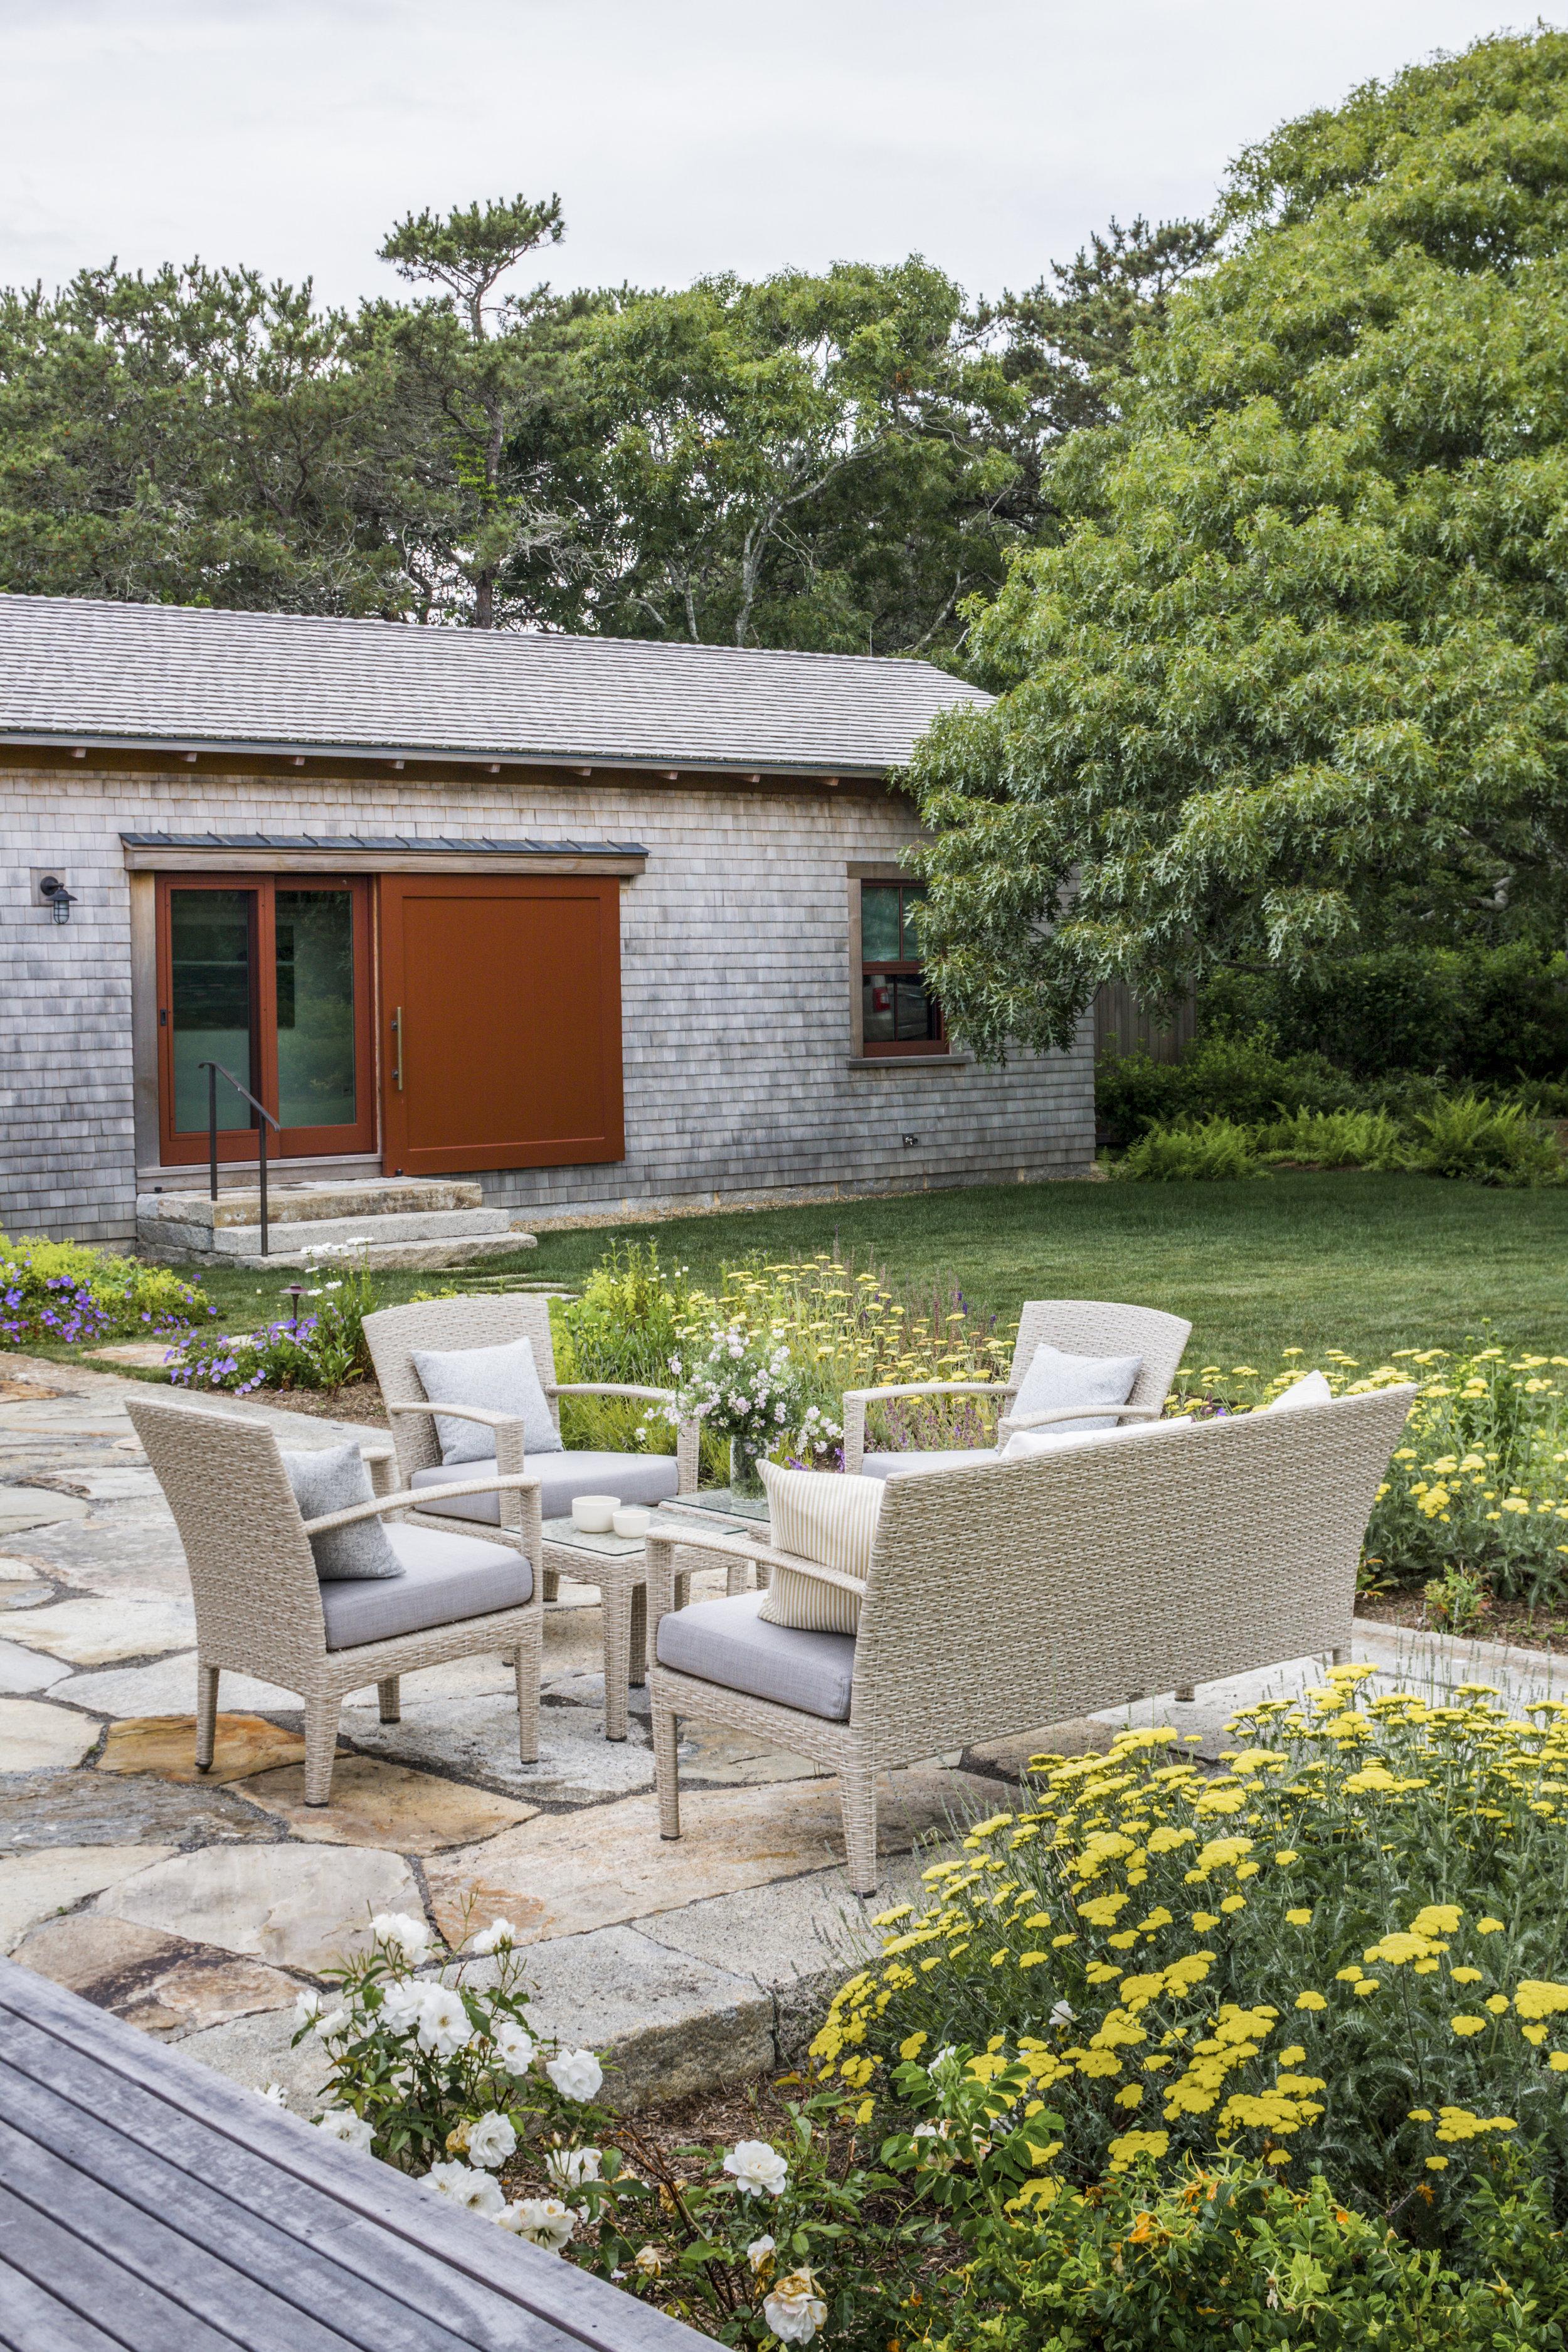 18 Exterior Front Garden_Y3I7651-Edit.jpg